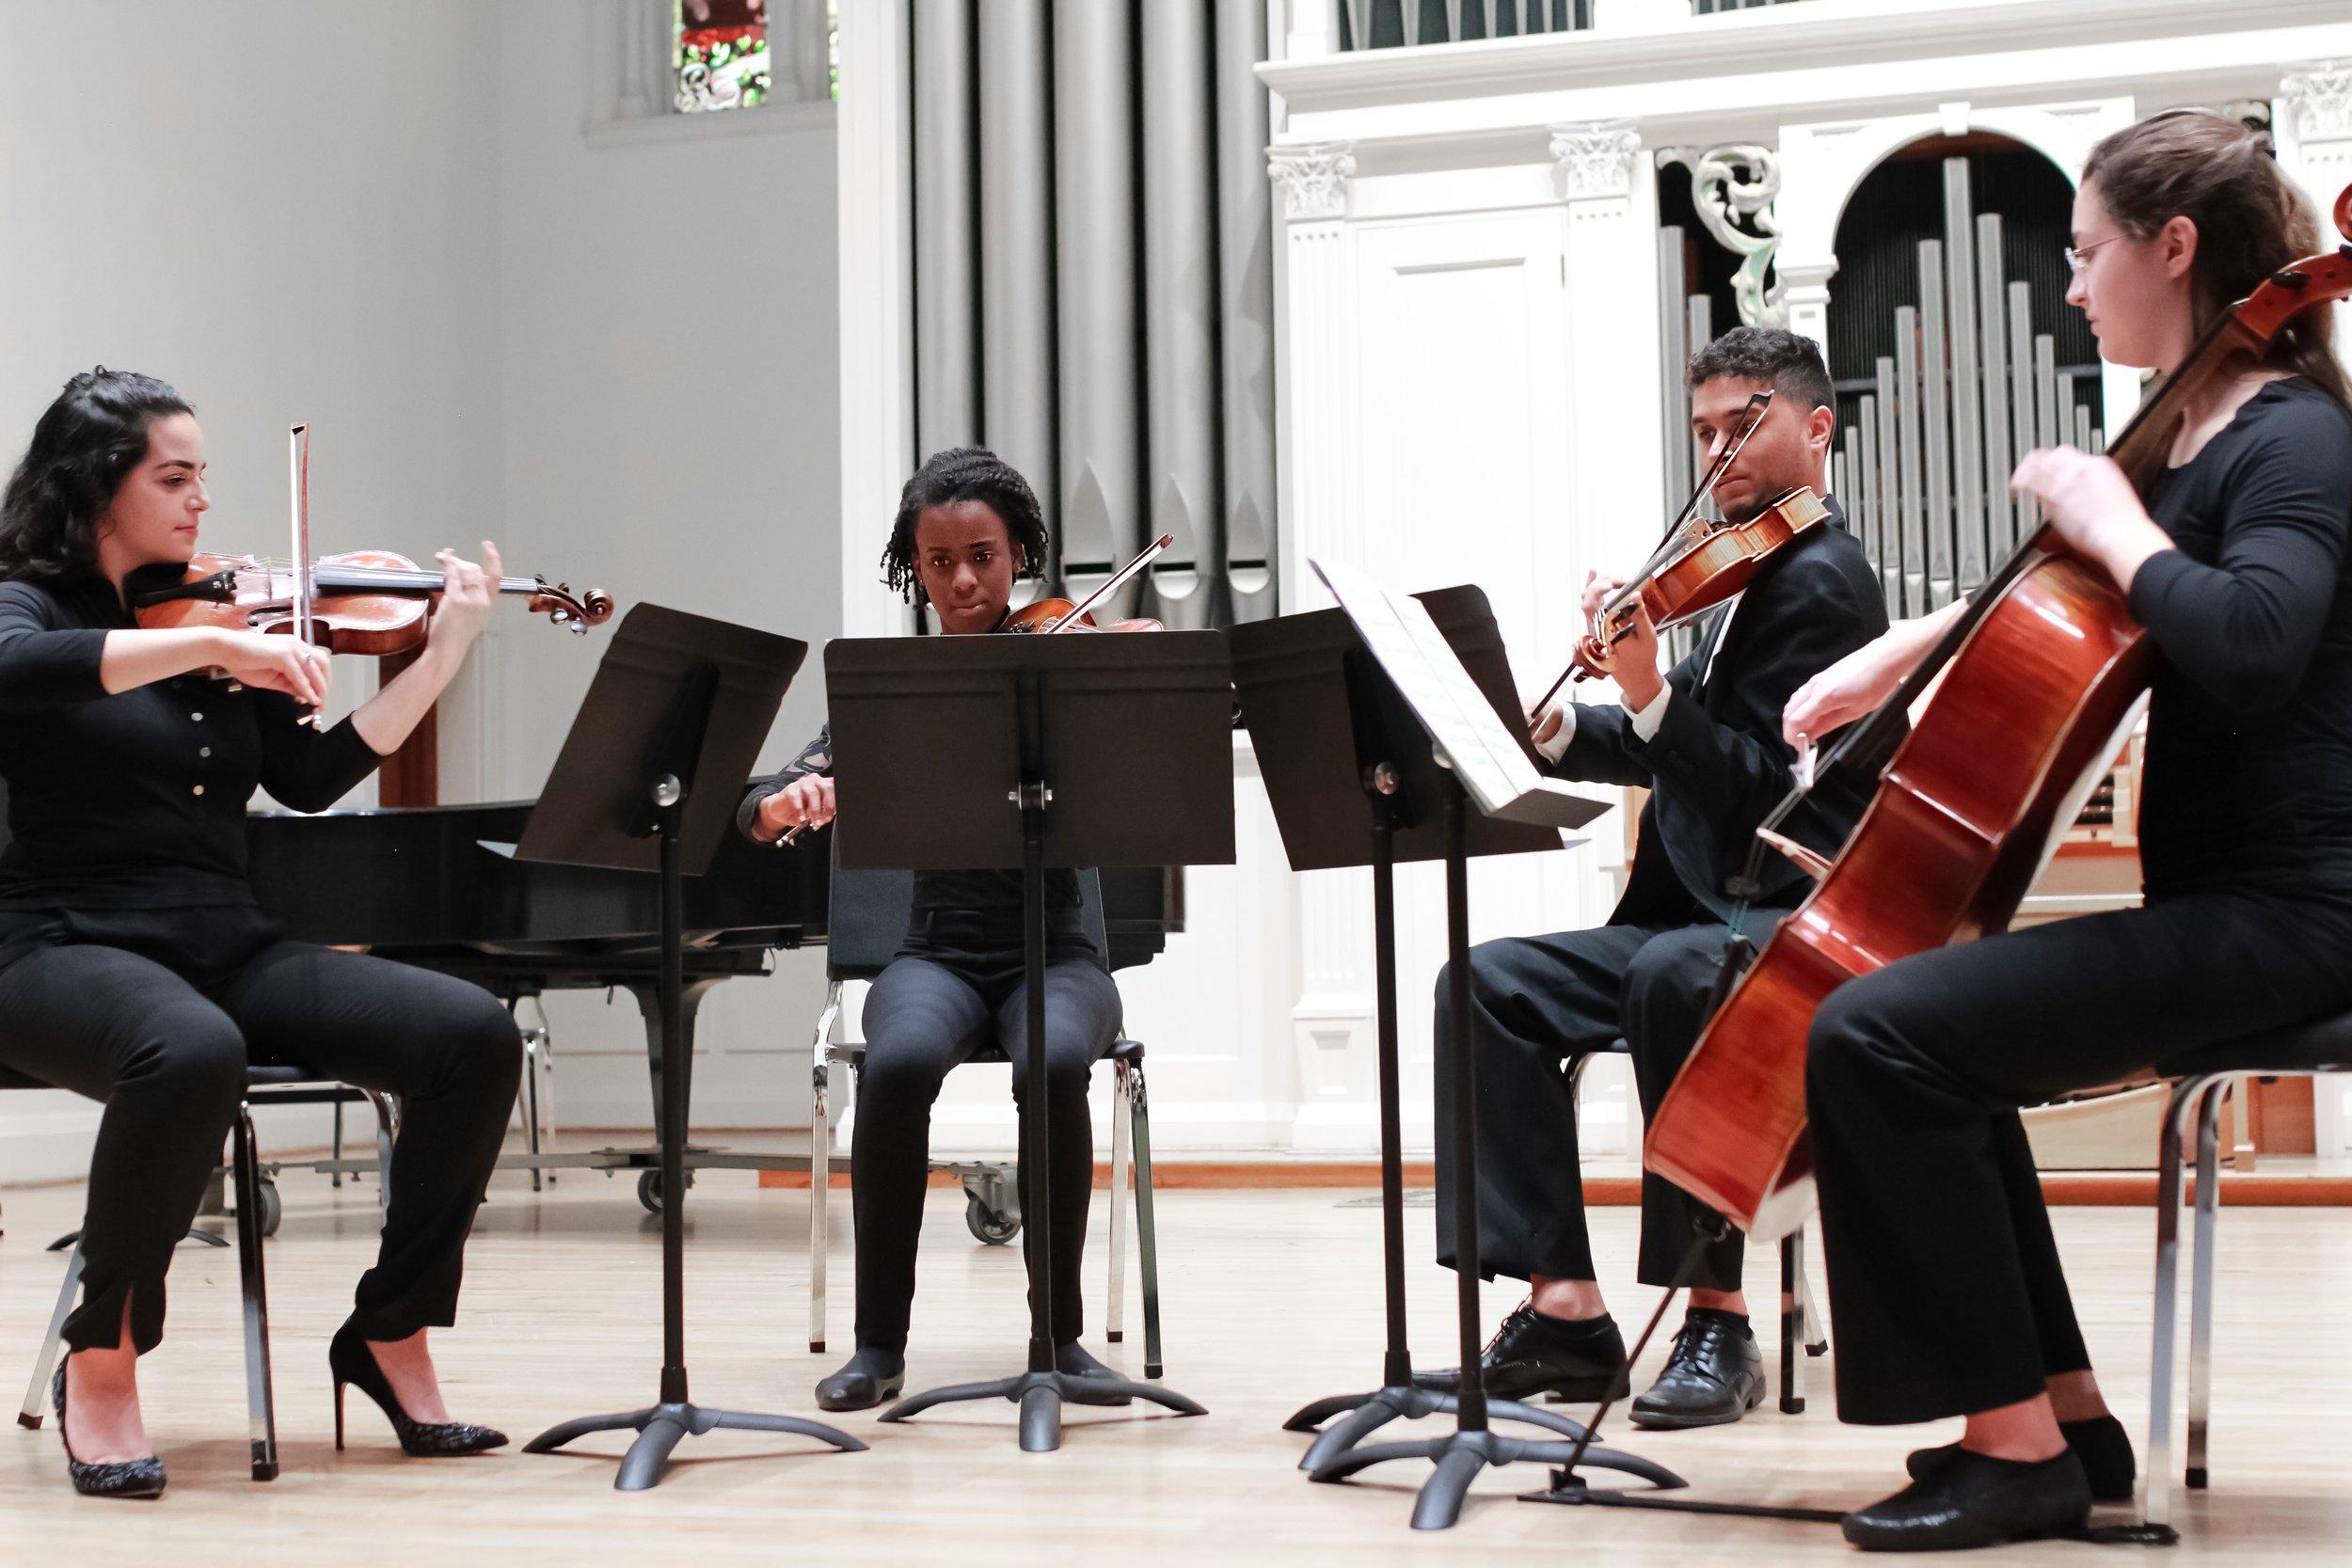 Gabriella Martinez (violin 1), Jaida Hawkins (violin 2), Kristian Gonzalez (viola), Megan Savage (cello)